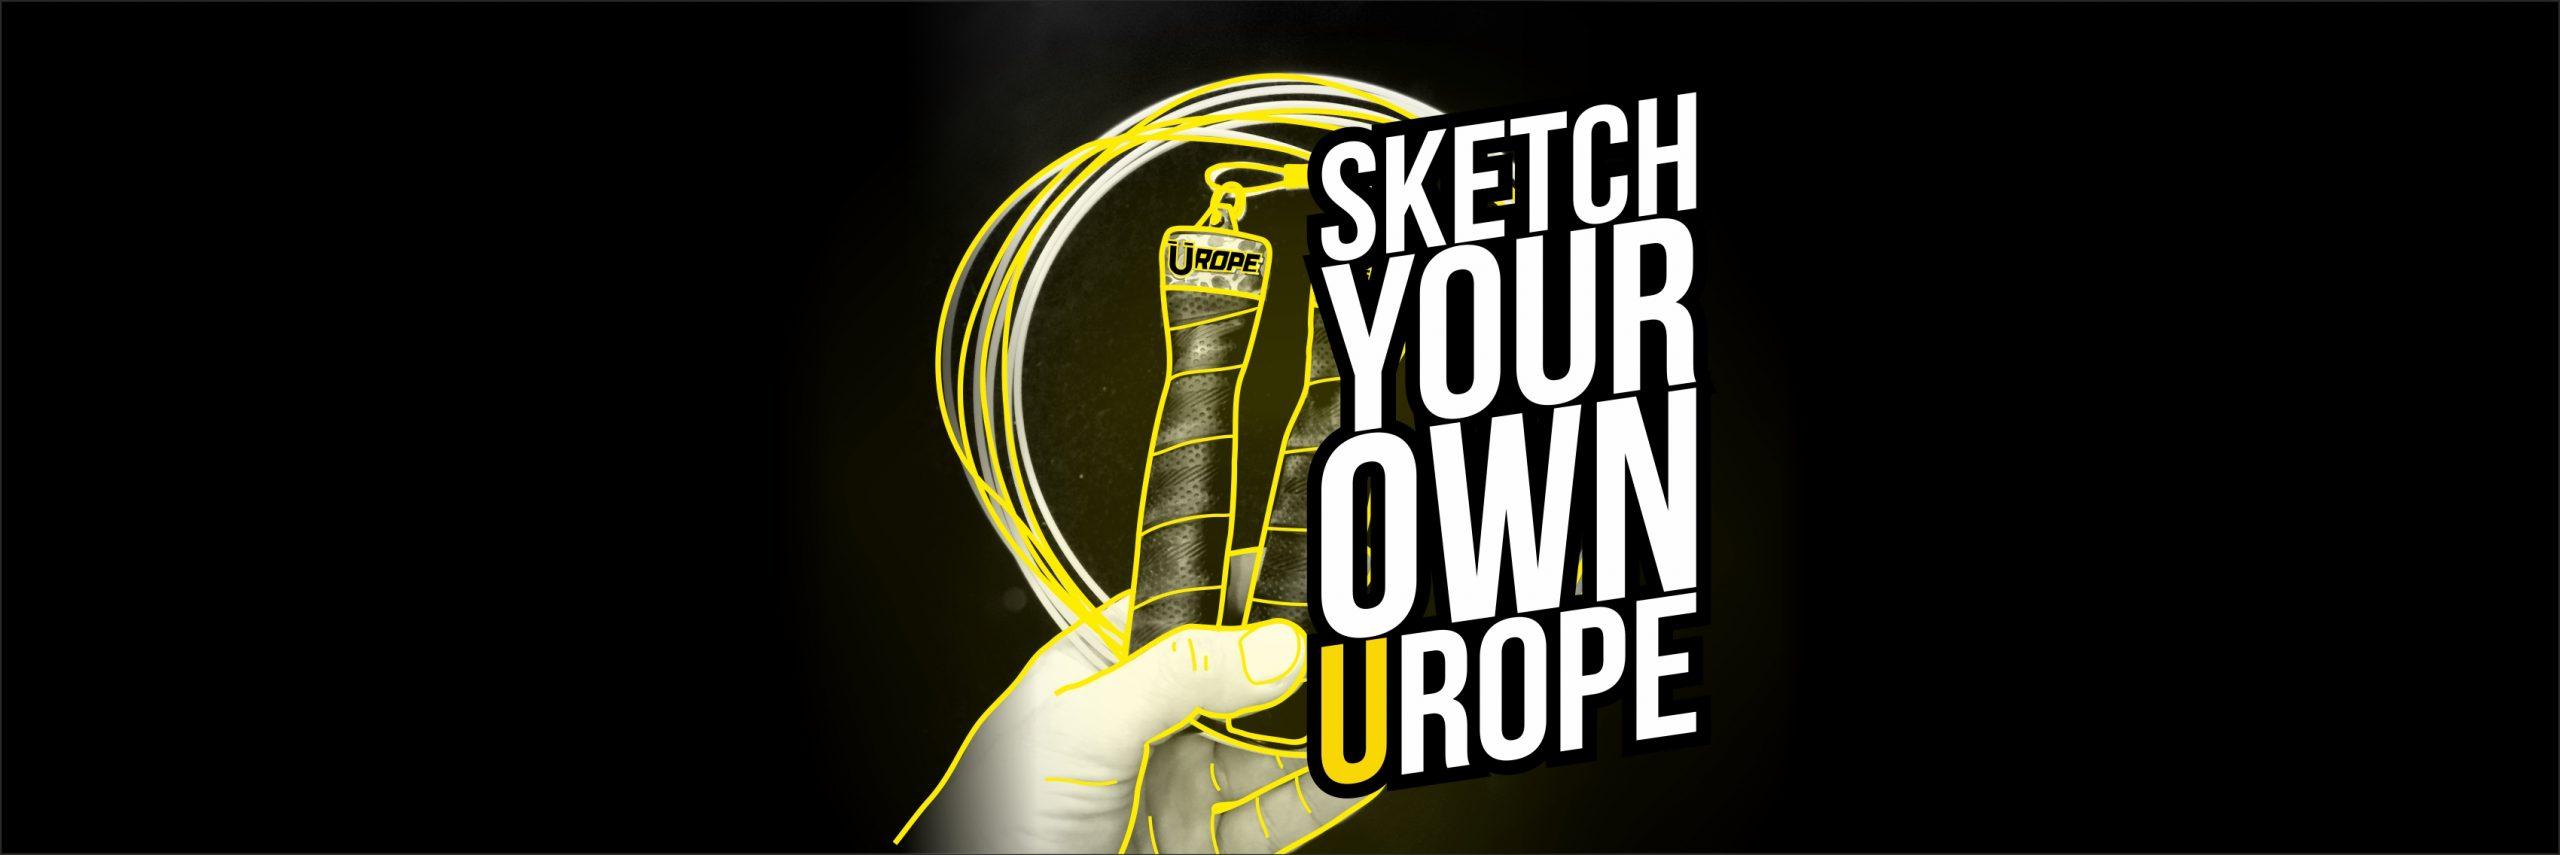 wyn-sketch-urope-banner